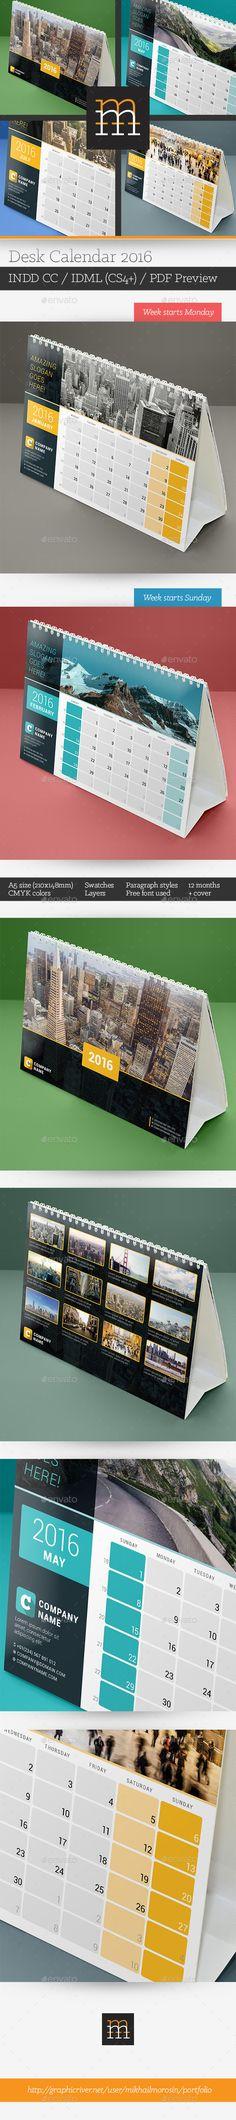 Desk Calendar 2016 Template PSD #design Download: http://graphicriver.net/item/-desk-calendar-2016-/13234450?ref=ksioks